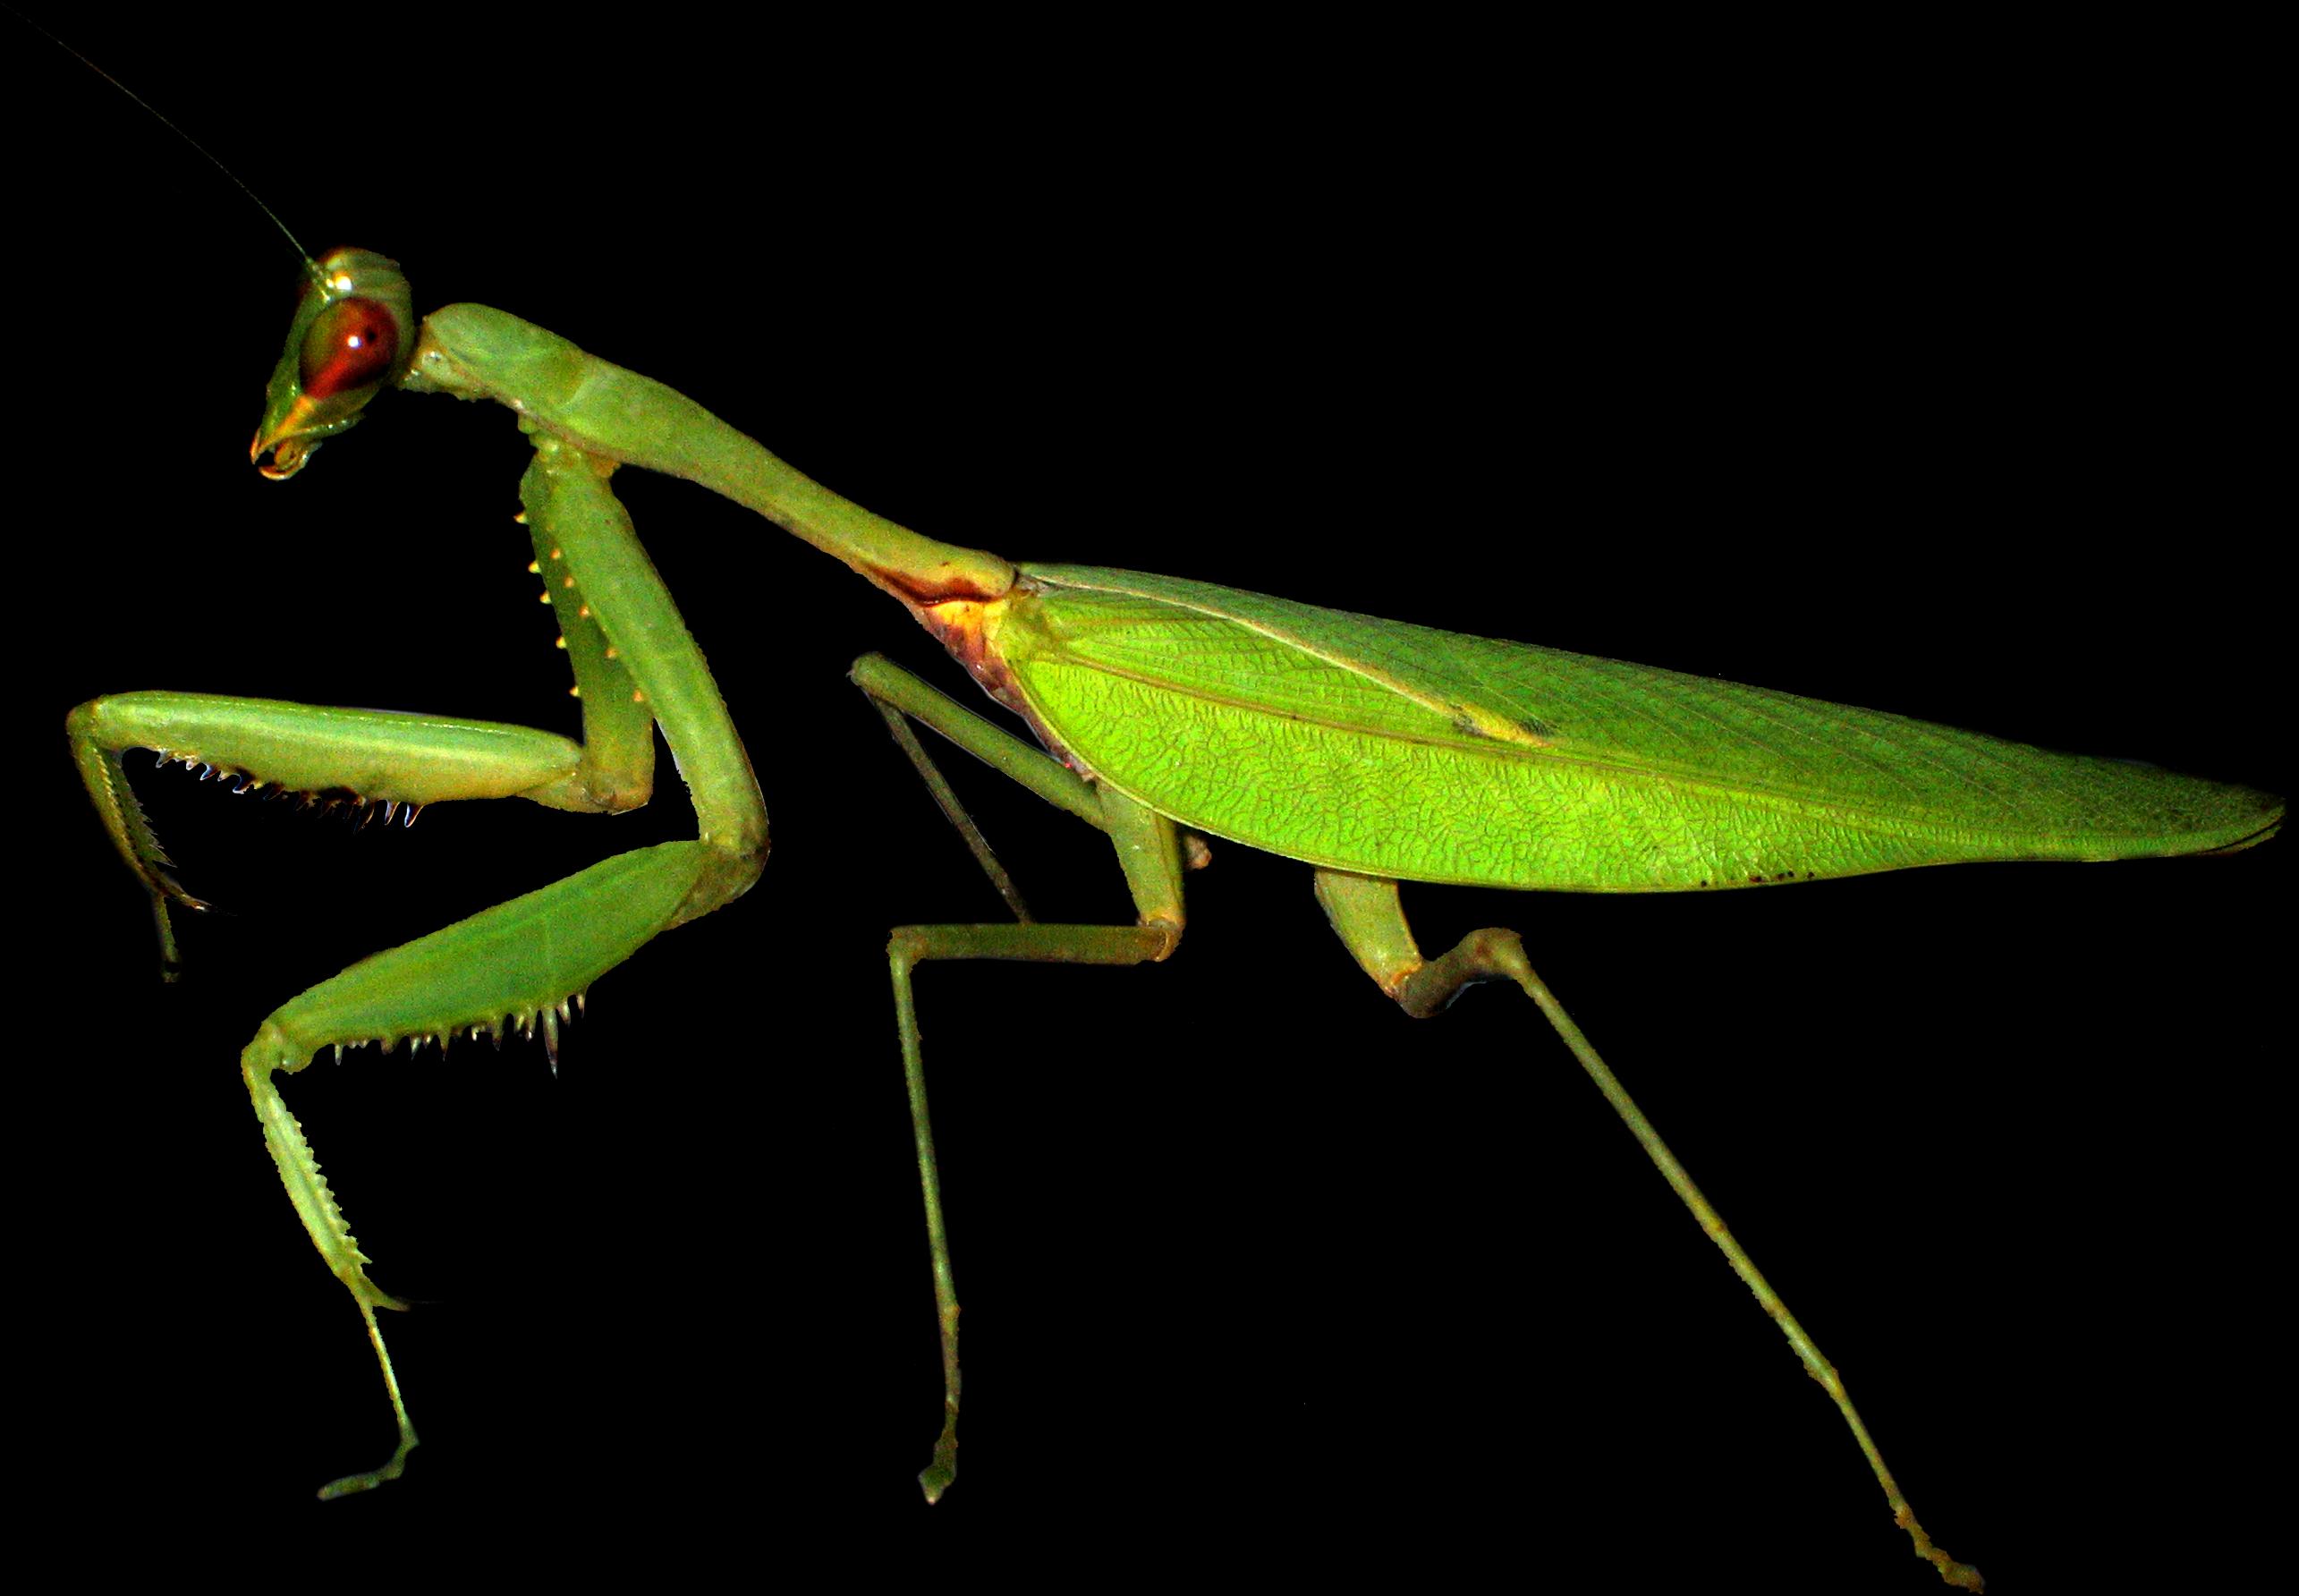 fichier european mantis mante religieuse png wikip u00e9dia Dragonfly Clip Art Dragonfly Clip Art